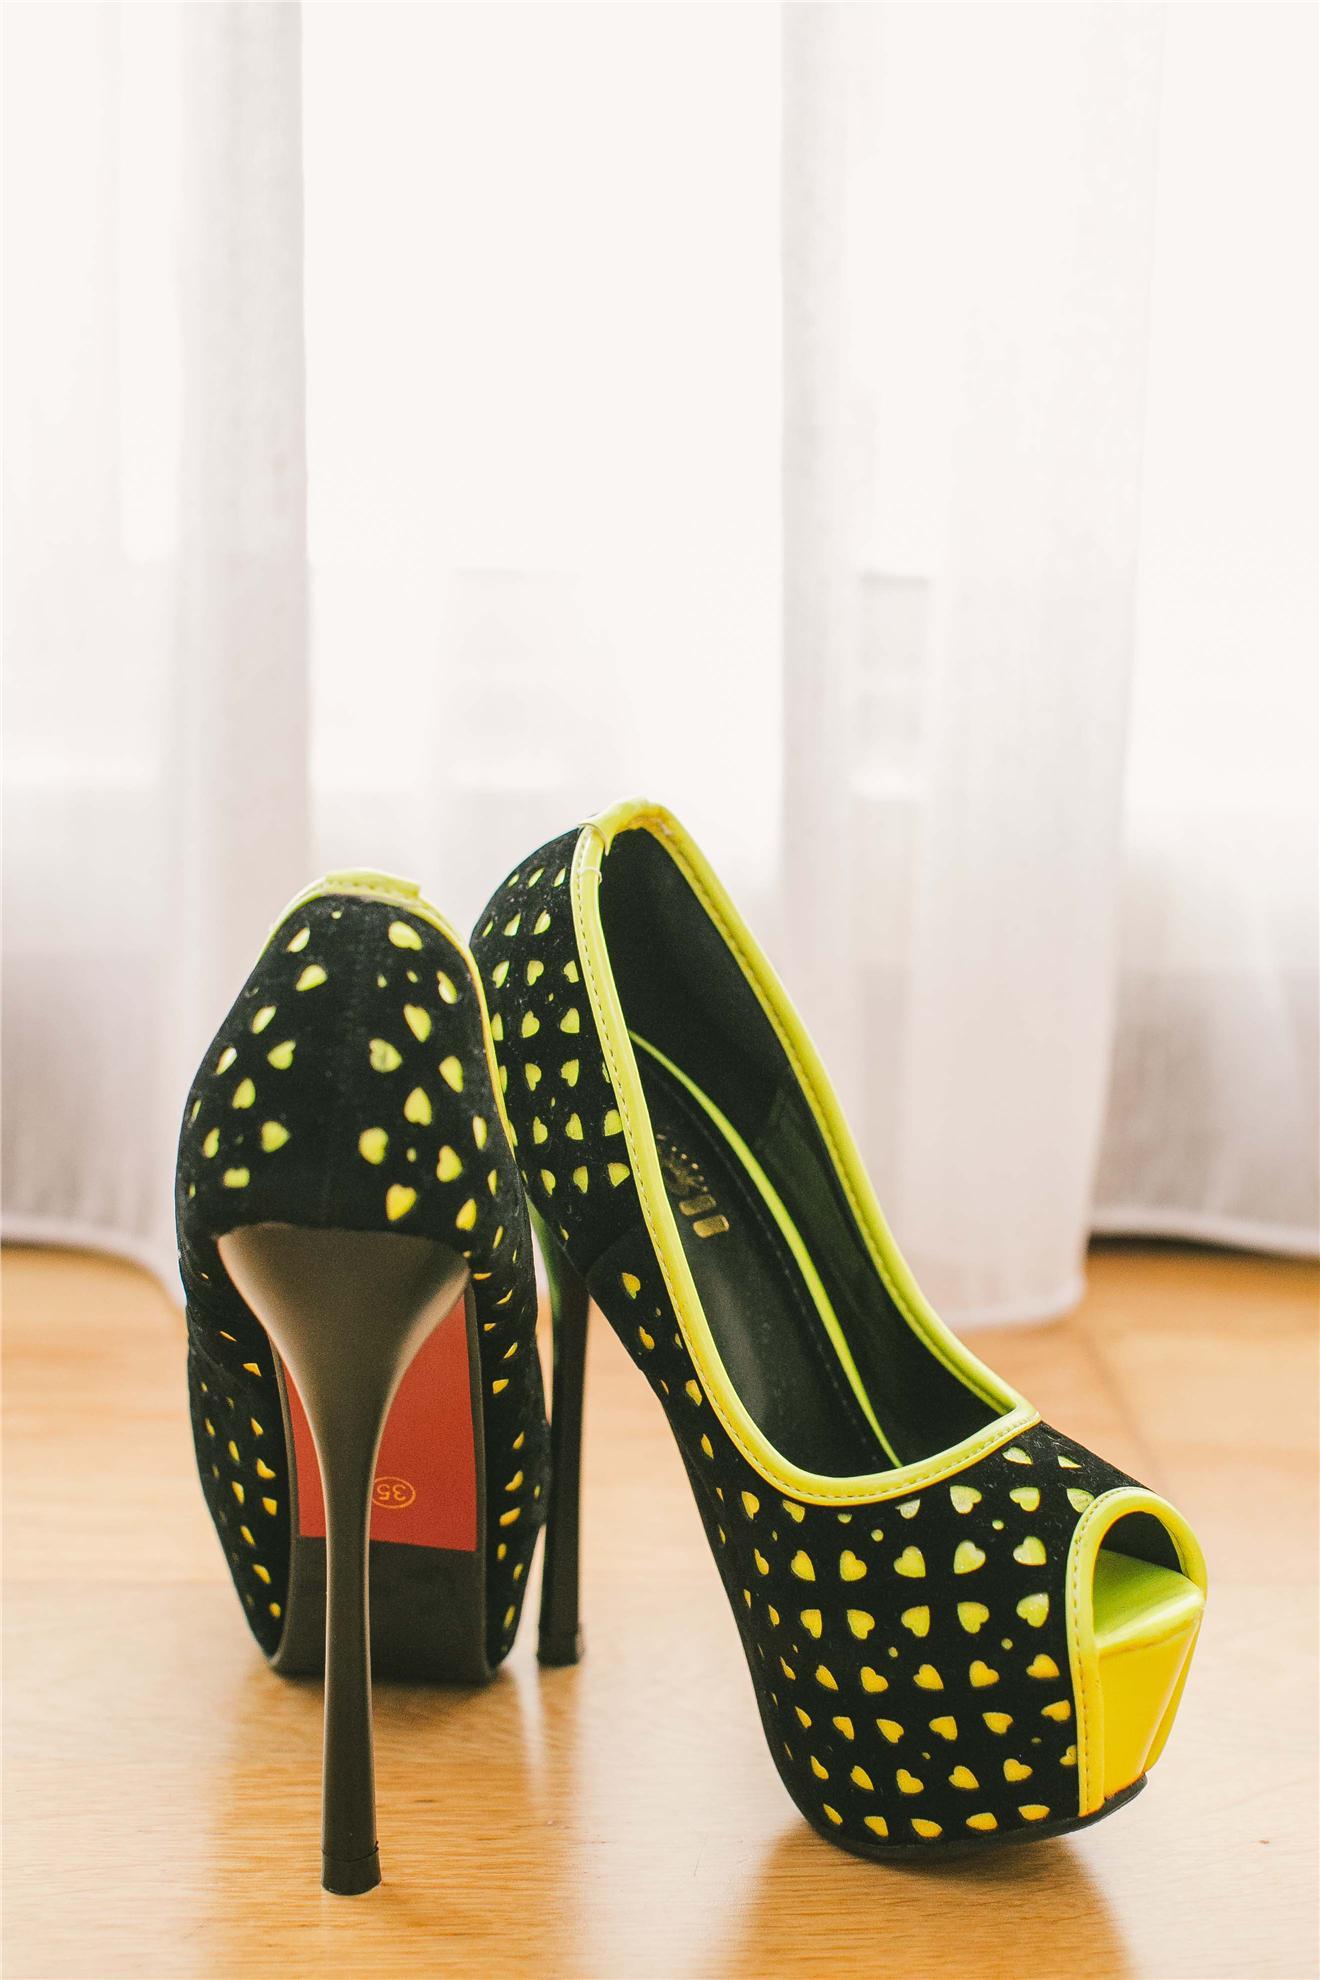 3bedbbde6eb Korea Fashion Stylish Design Yellow on Black Sexy High Heels Shoes